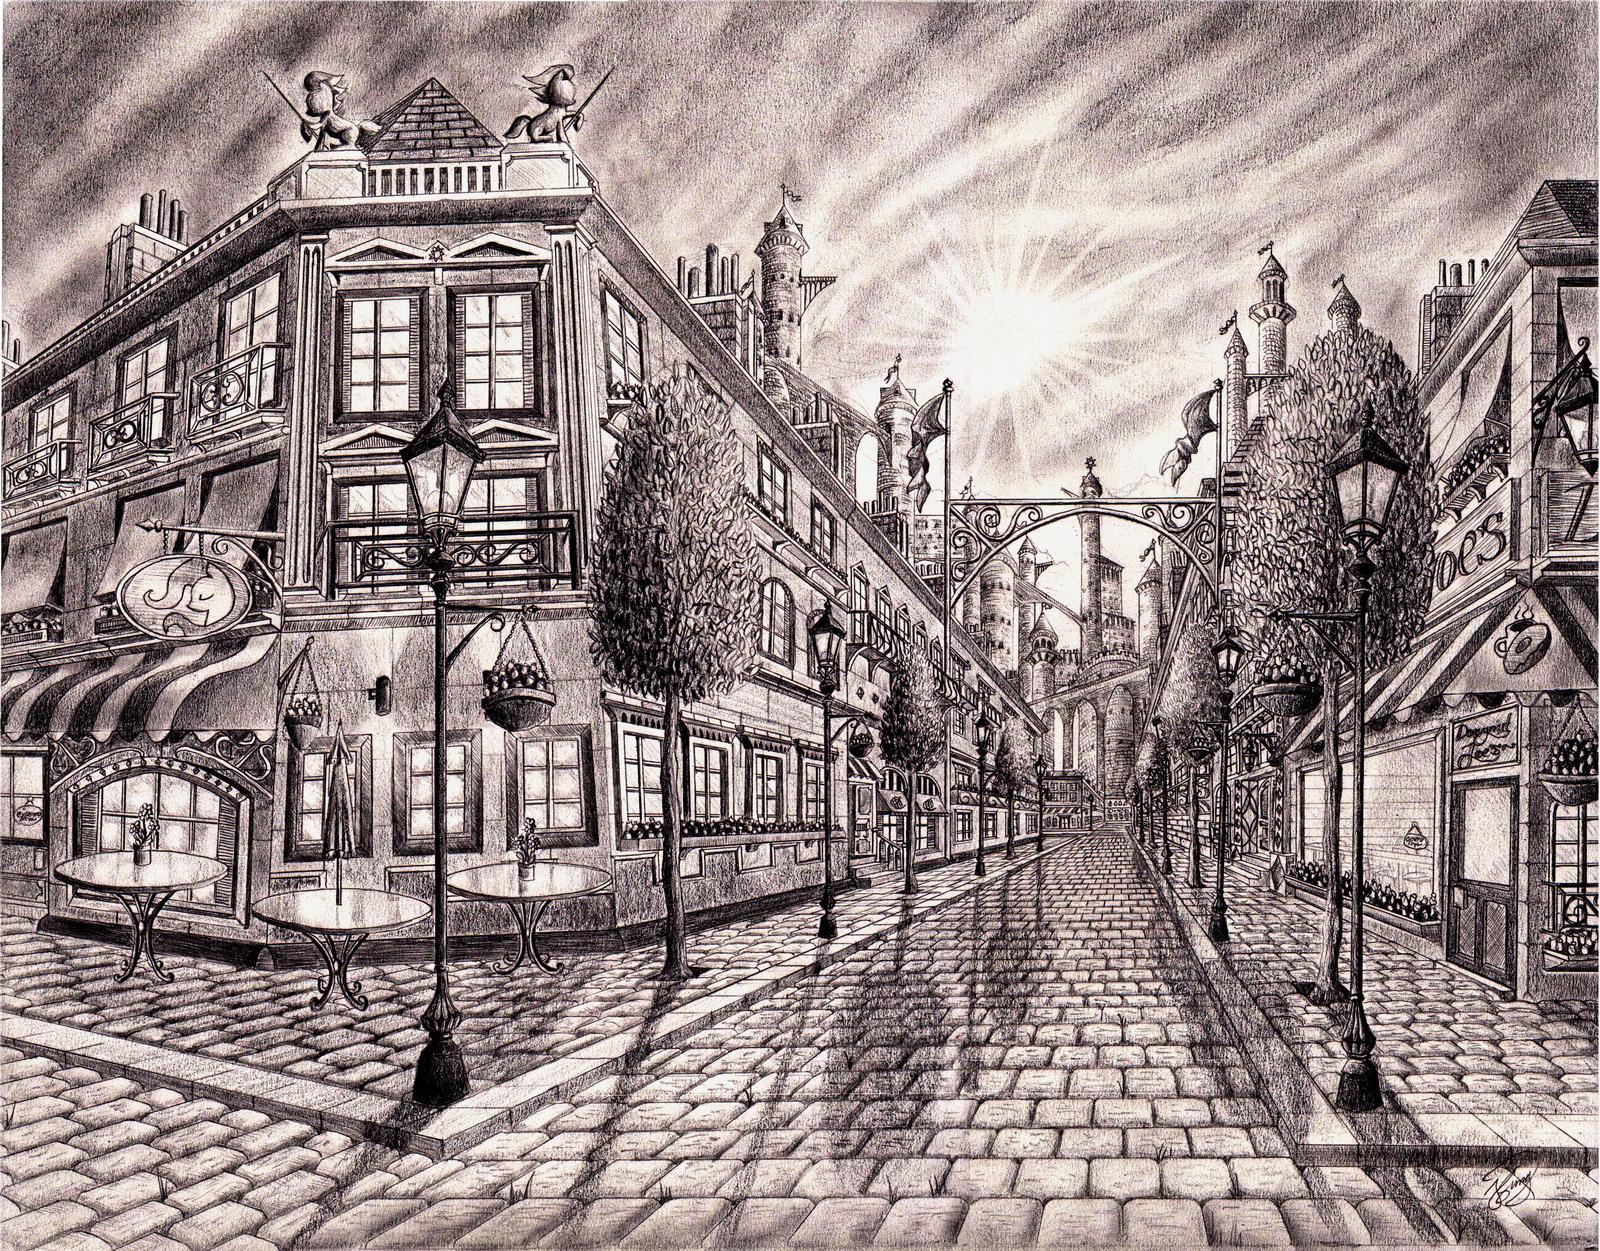 Canterlot streets interpretation by josh-5410